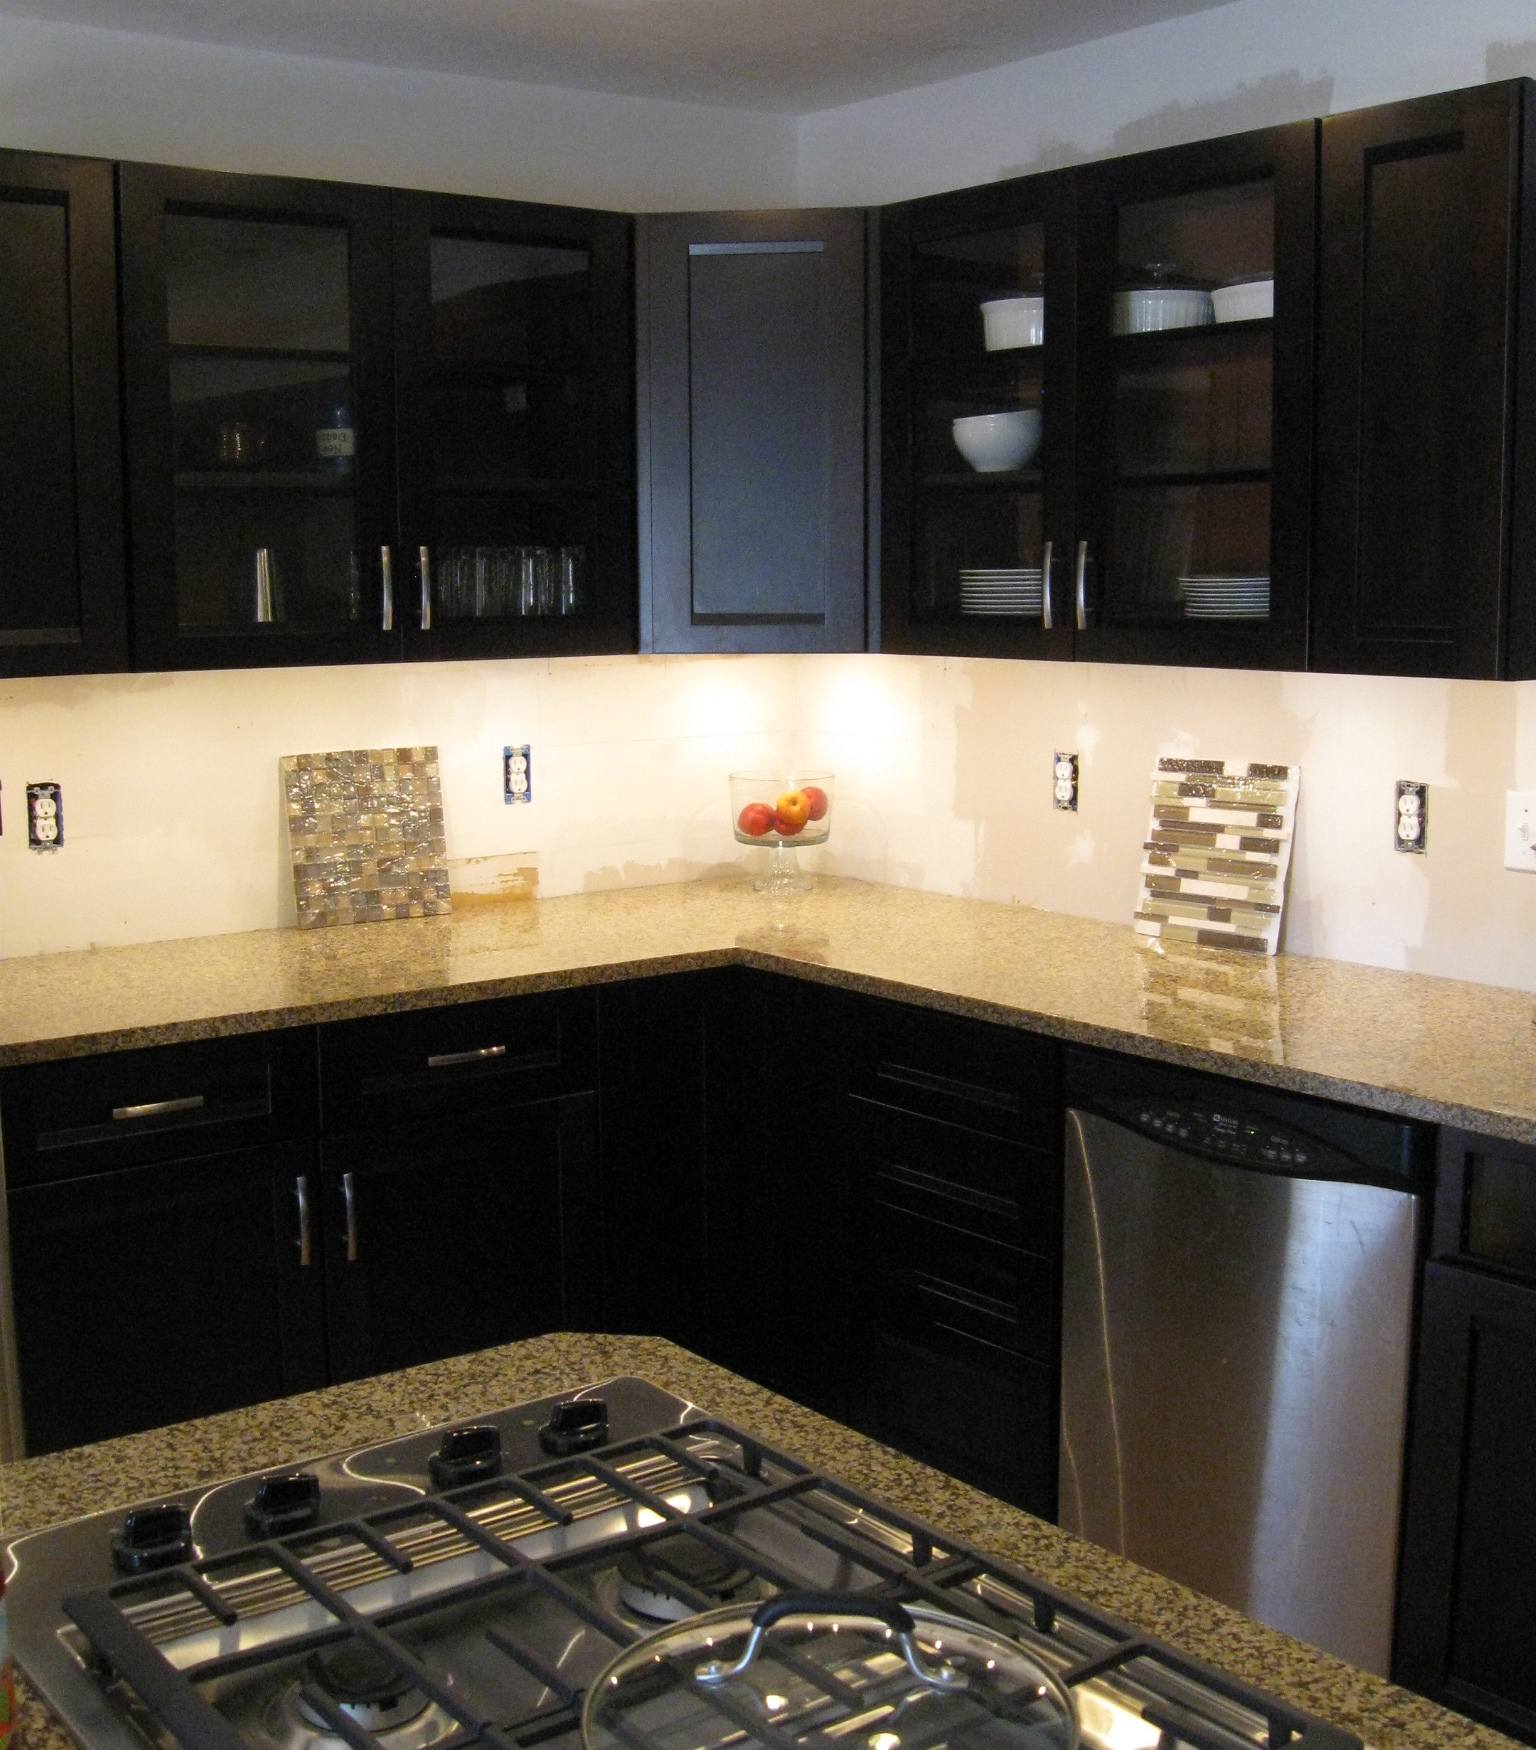 kitchenazcabinets kitchen cabinets phoenix Free LED Under Cabinet Lighting Glendale AZ